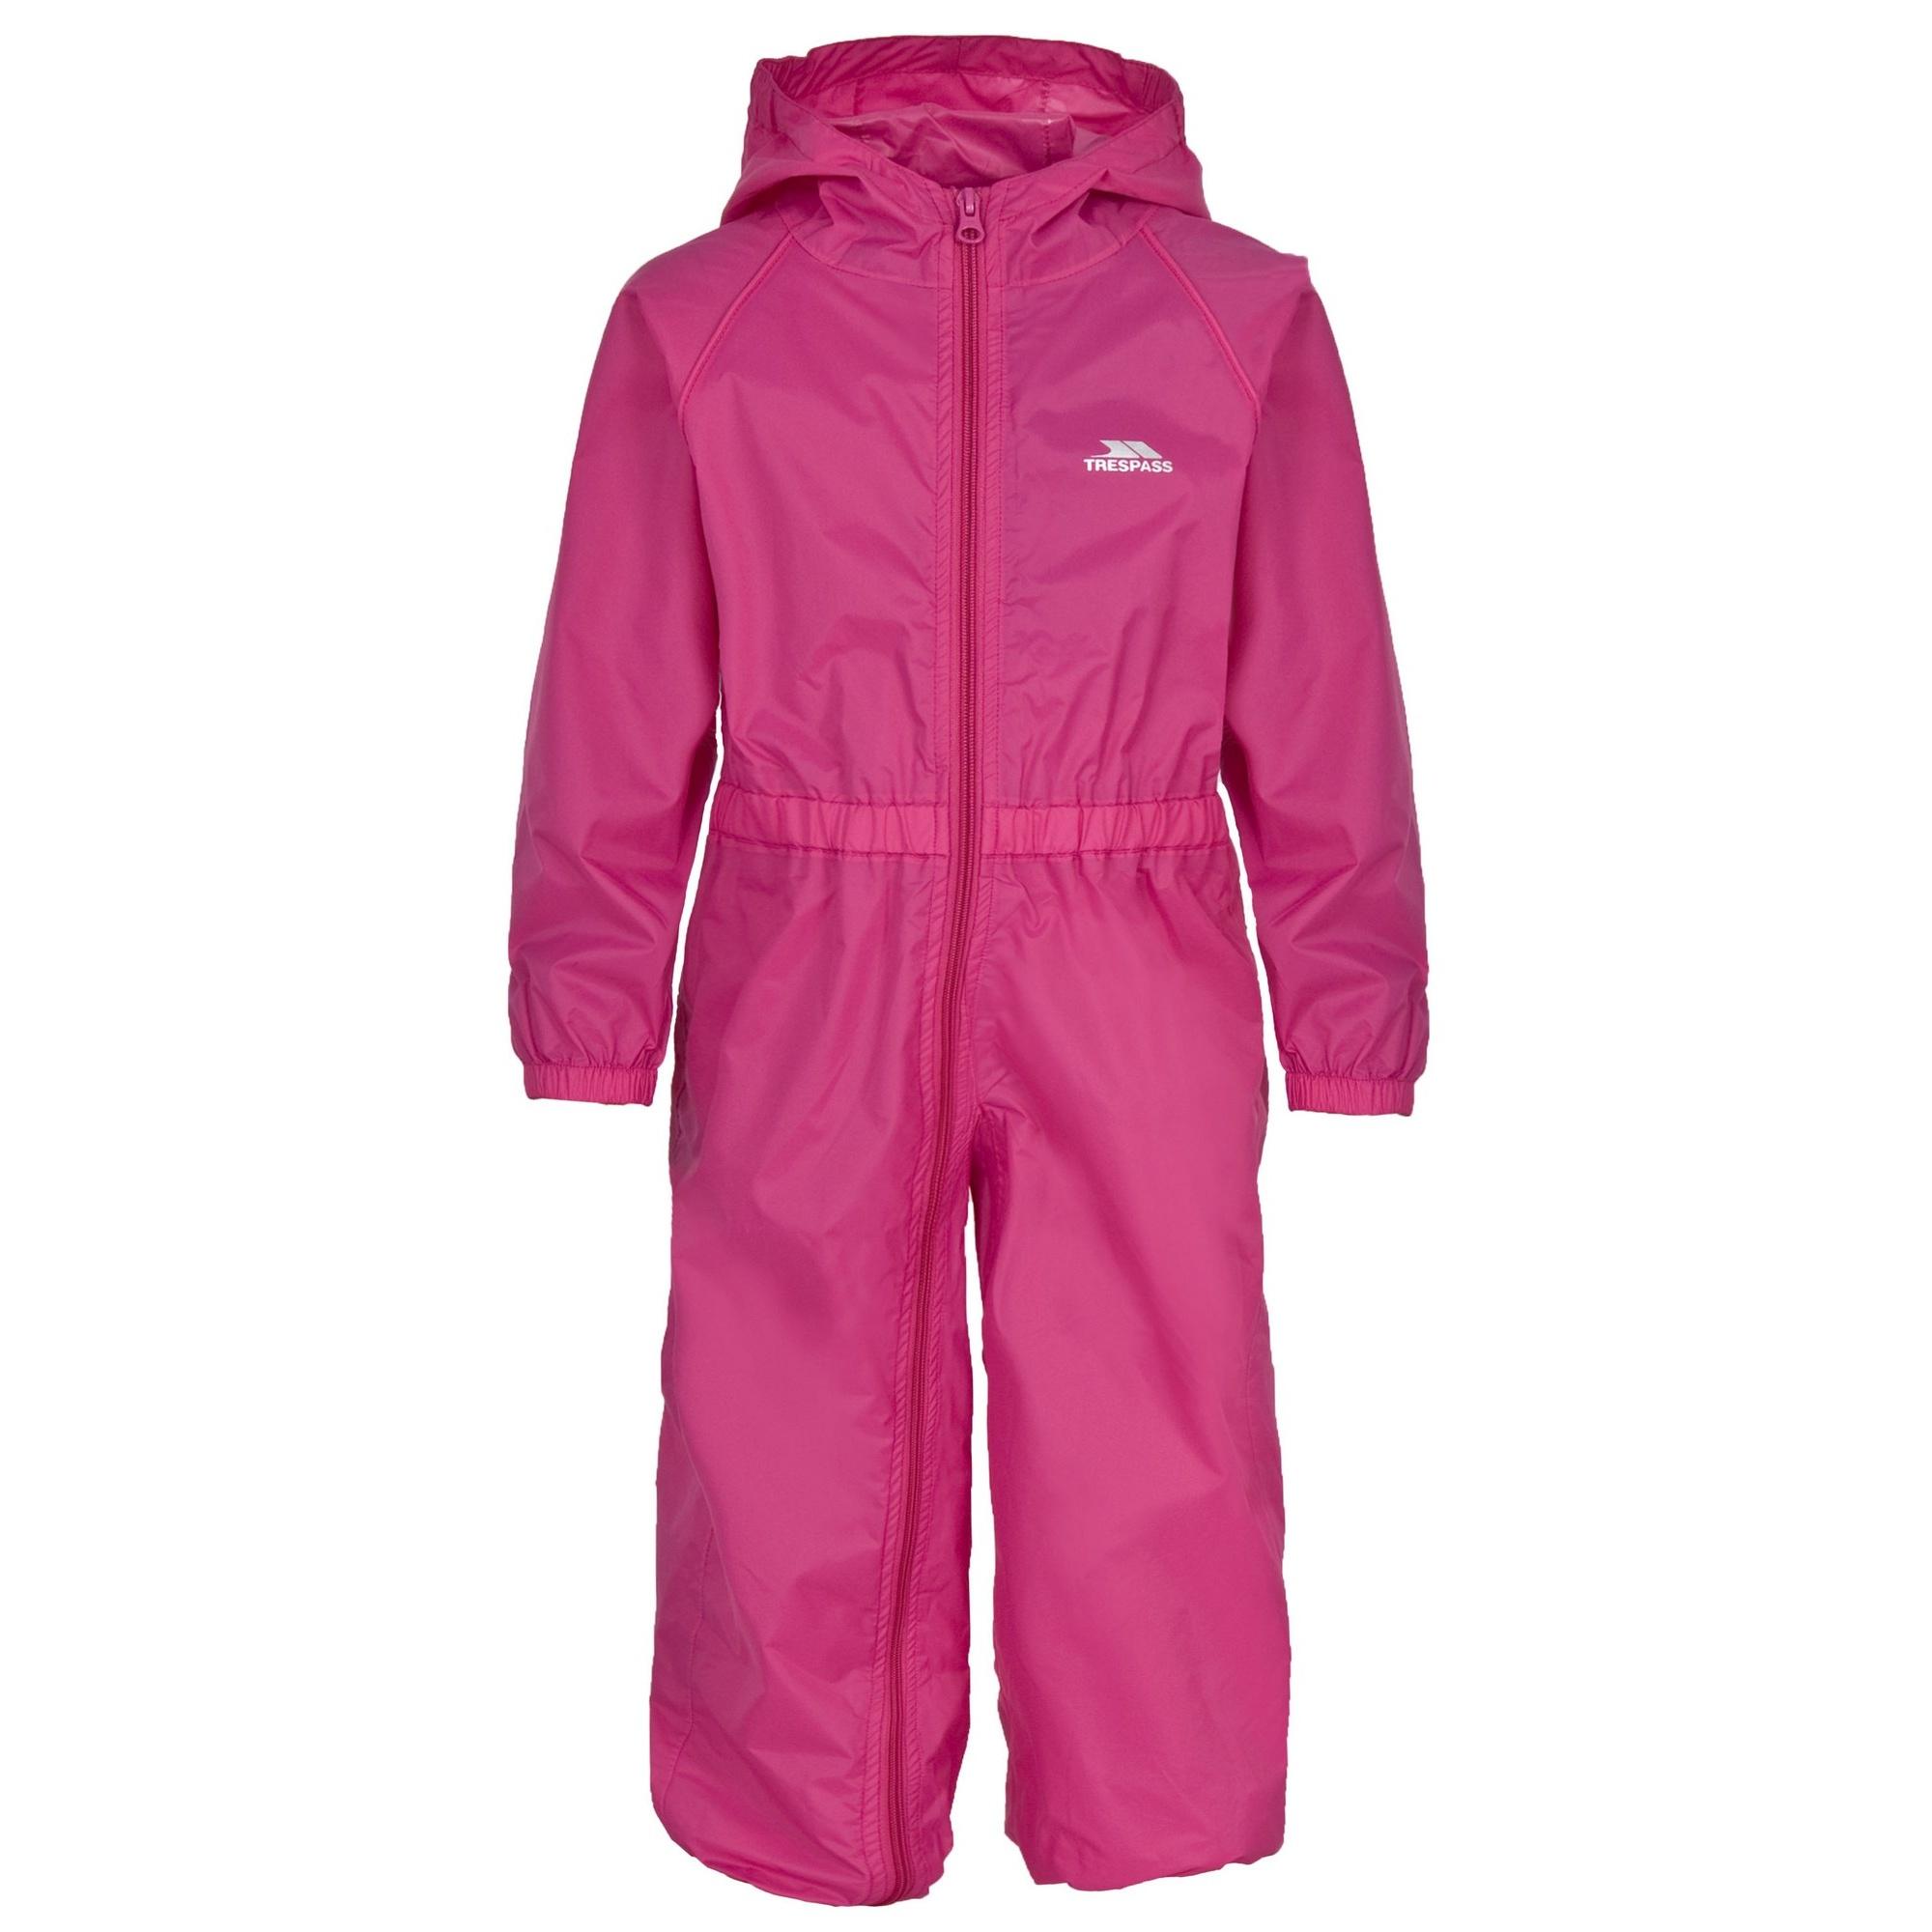 Regatta Great Outdoors Kids Charco Waterproof Rain Suit